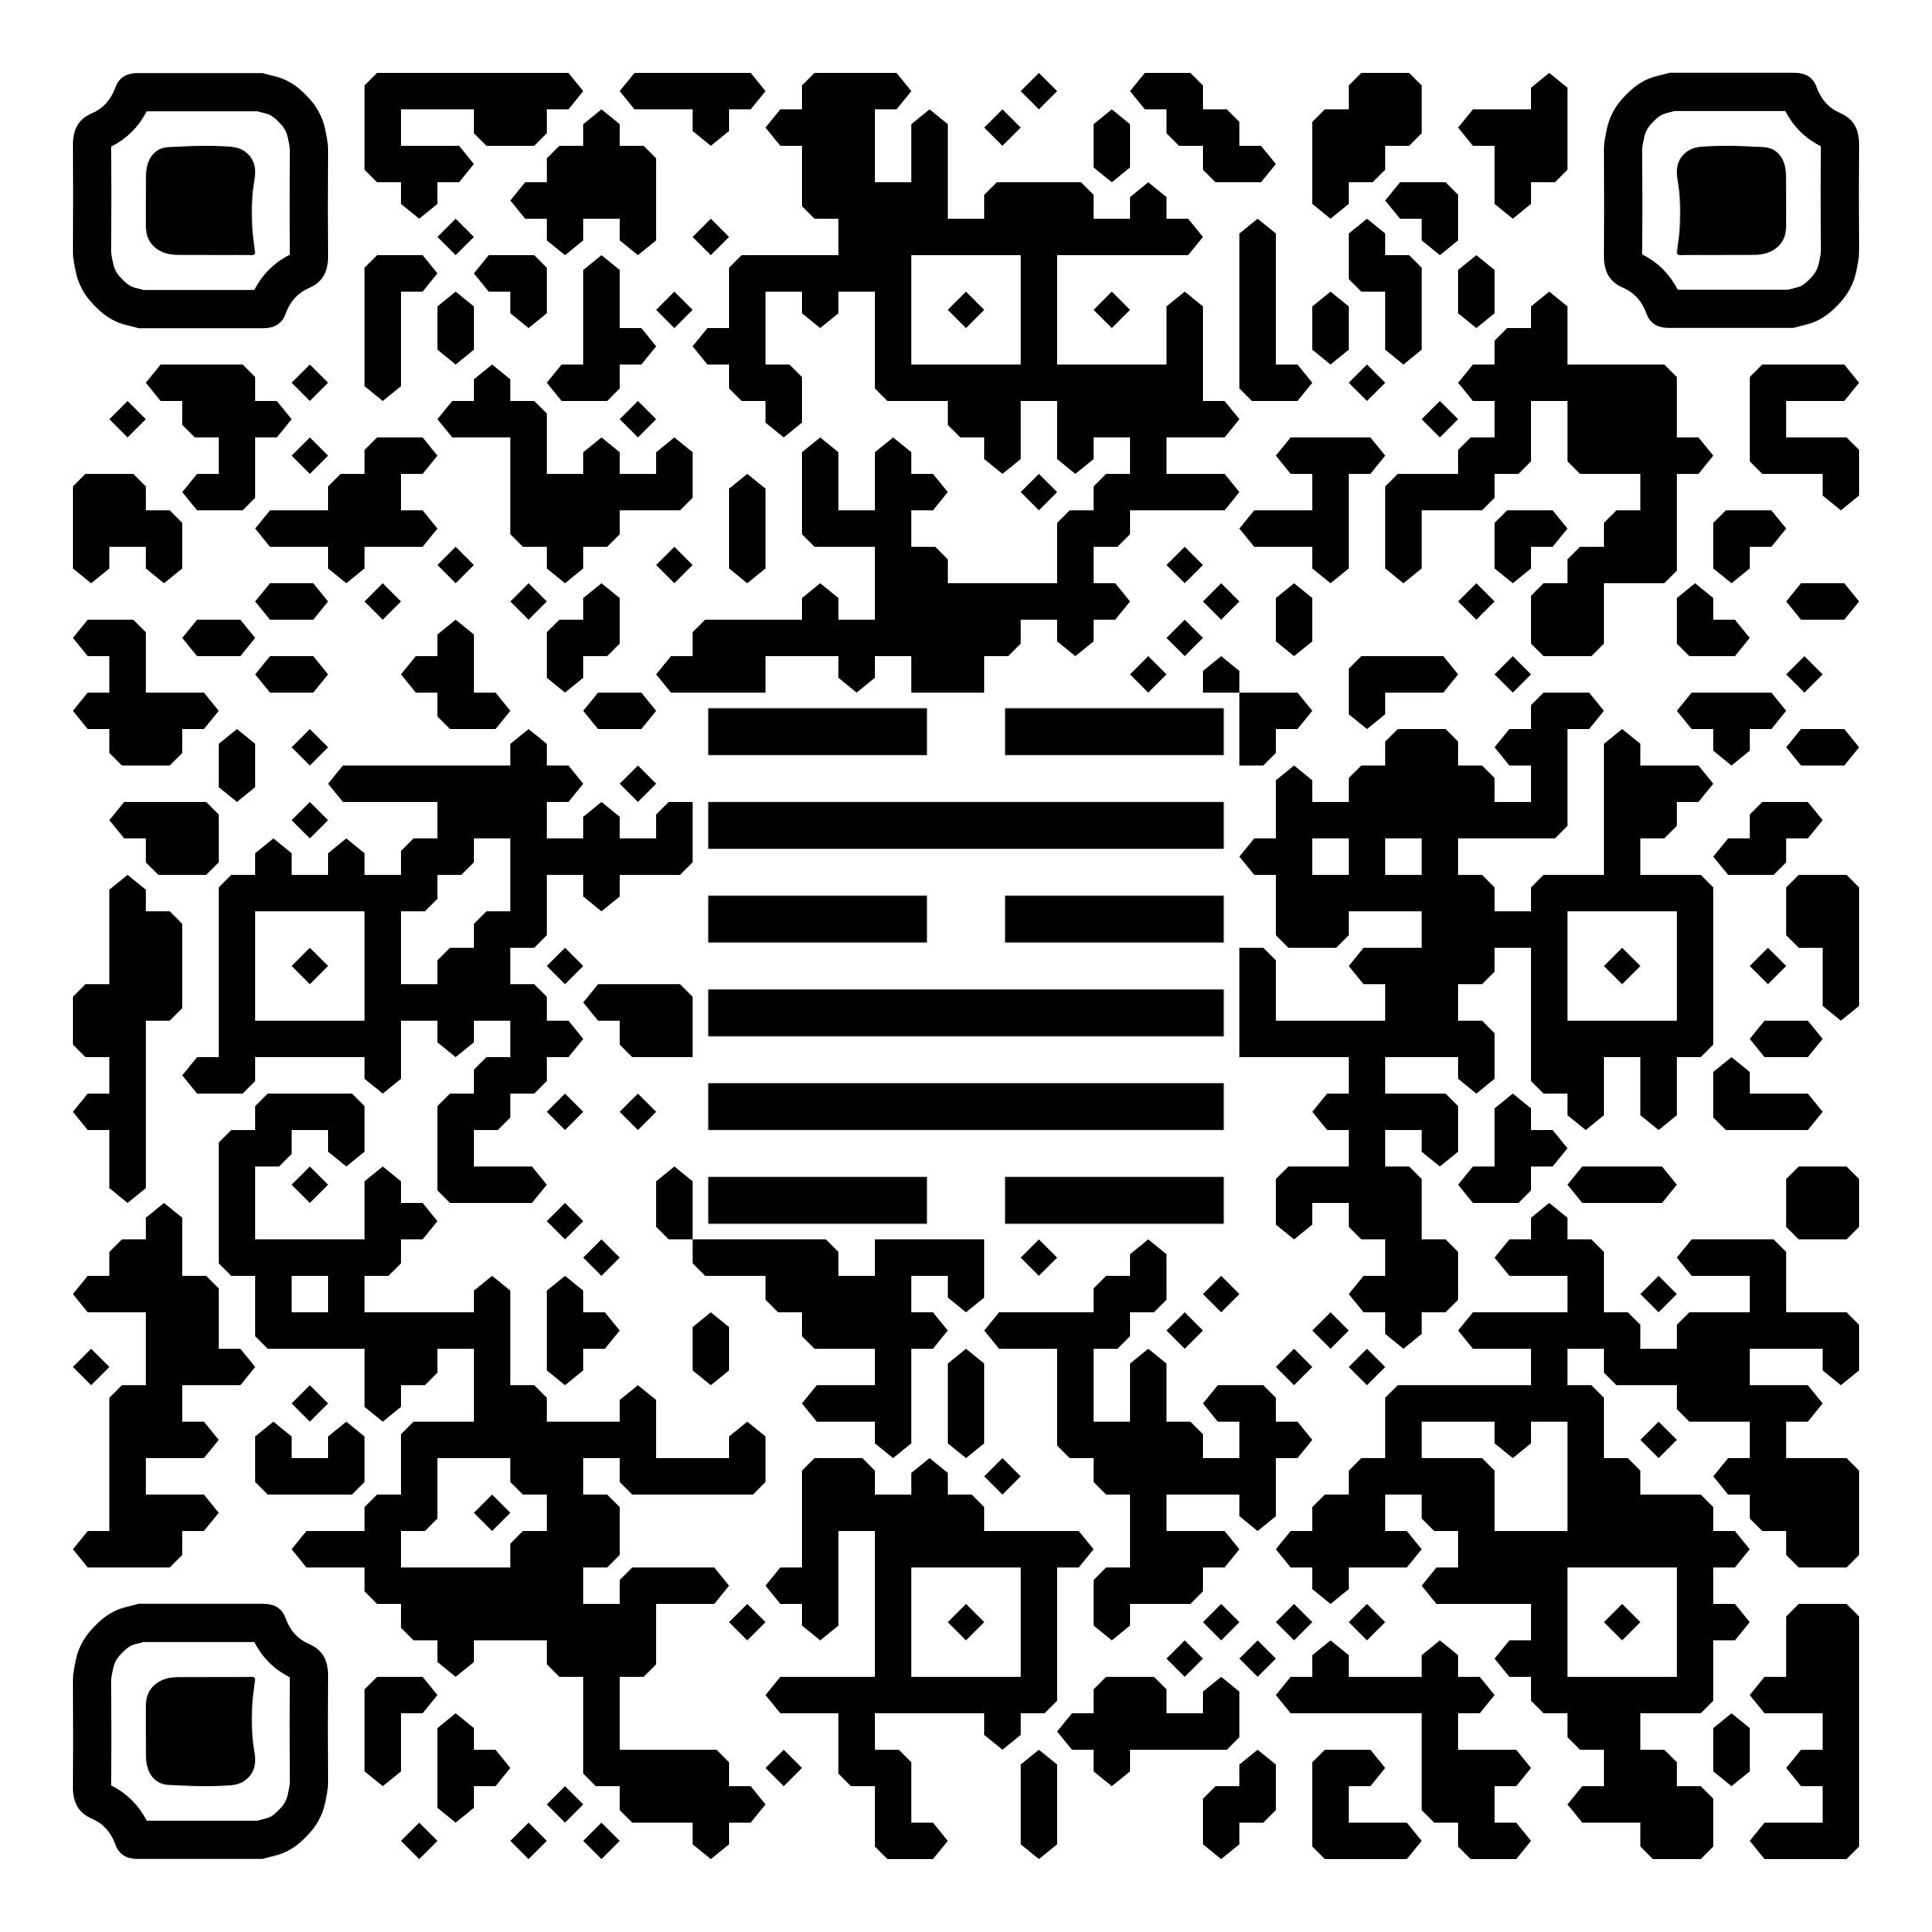 qr-code-48.png